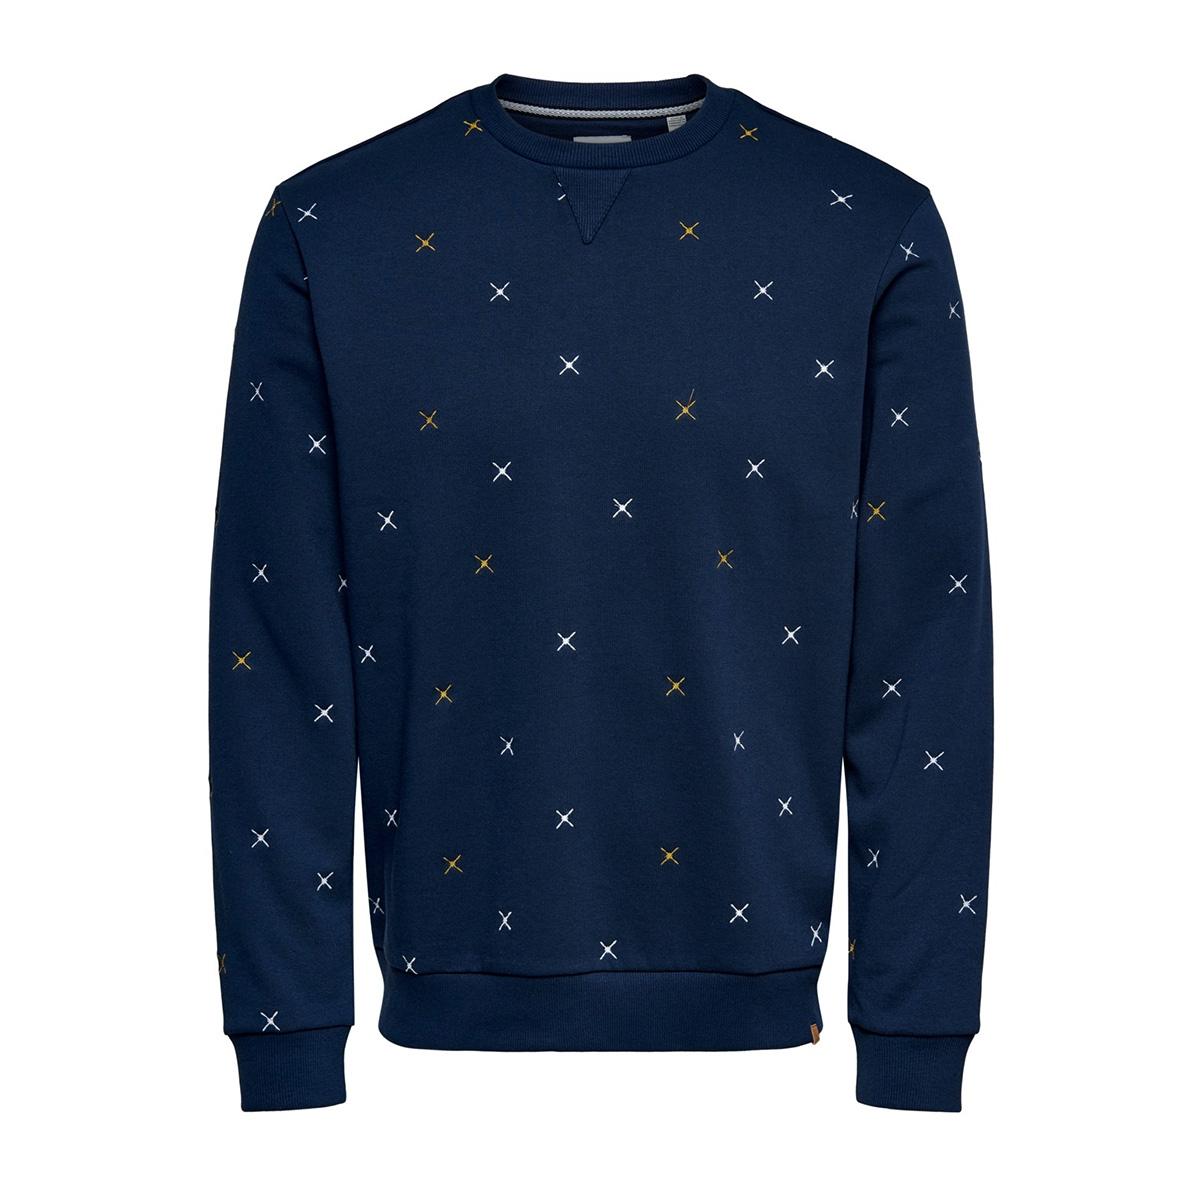 onsmsoren slim crewneck sweat 22014894 only & sons sweater dress blues